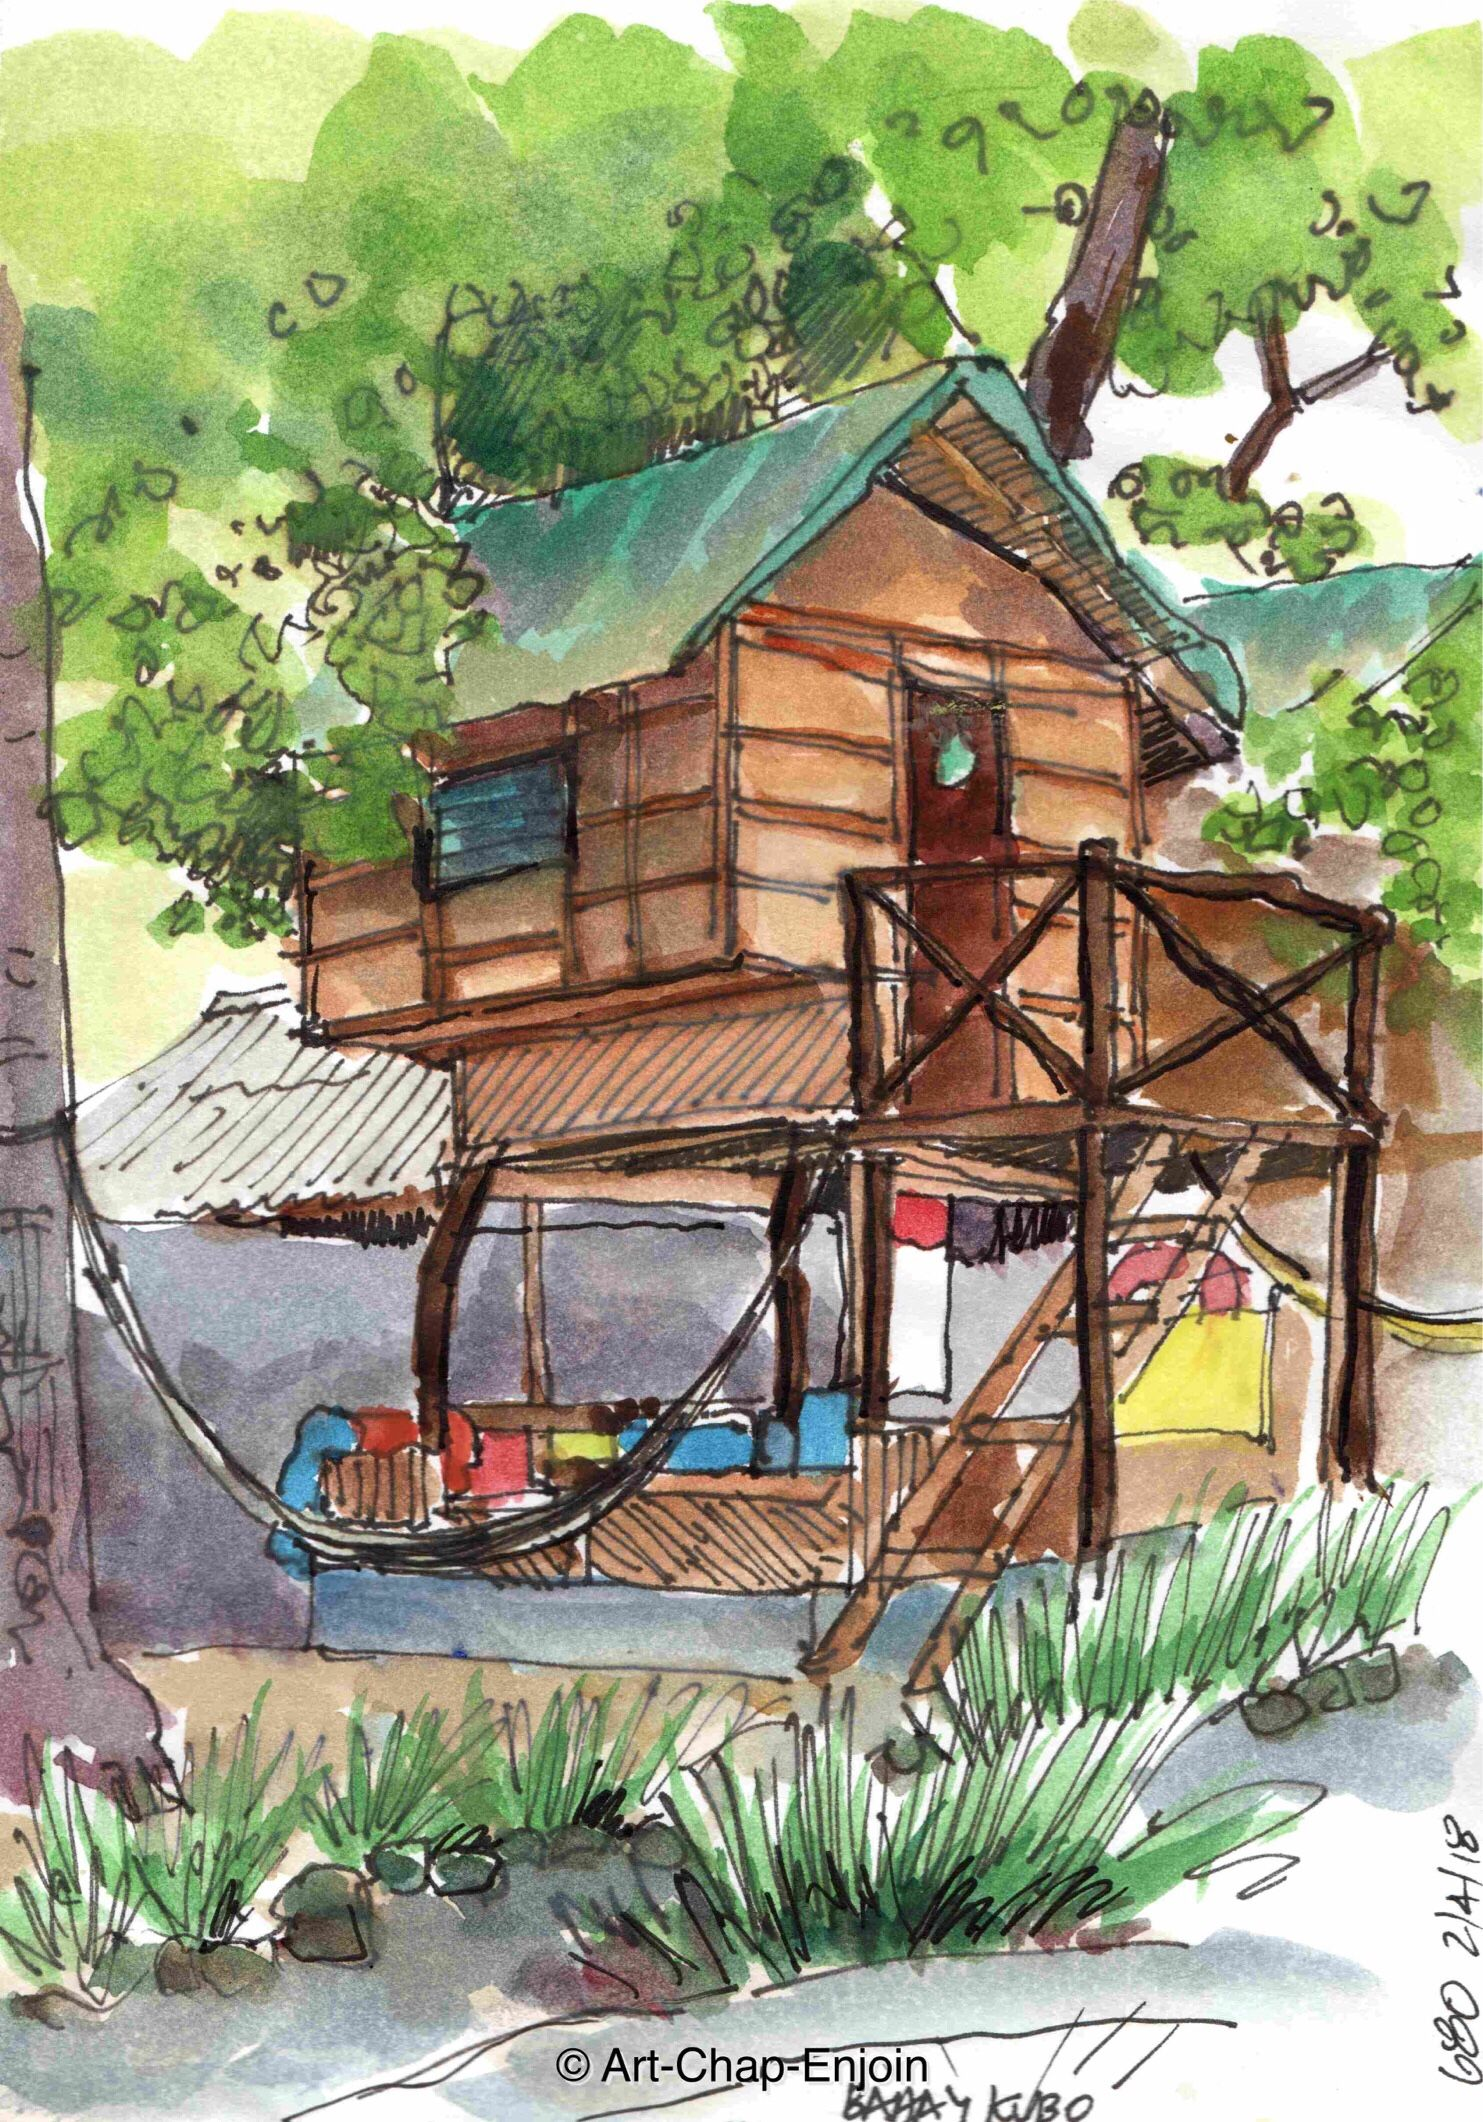 Bahay Kubo Design Philippines : bahay, design, philippines, Bahay, Kubo,, Design, Philippines,, Filipino